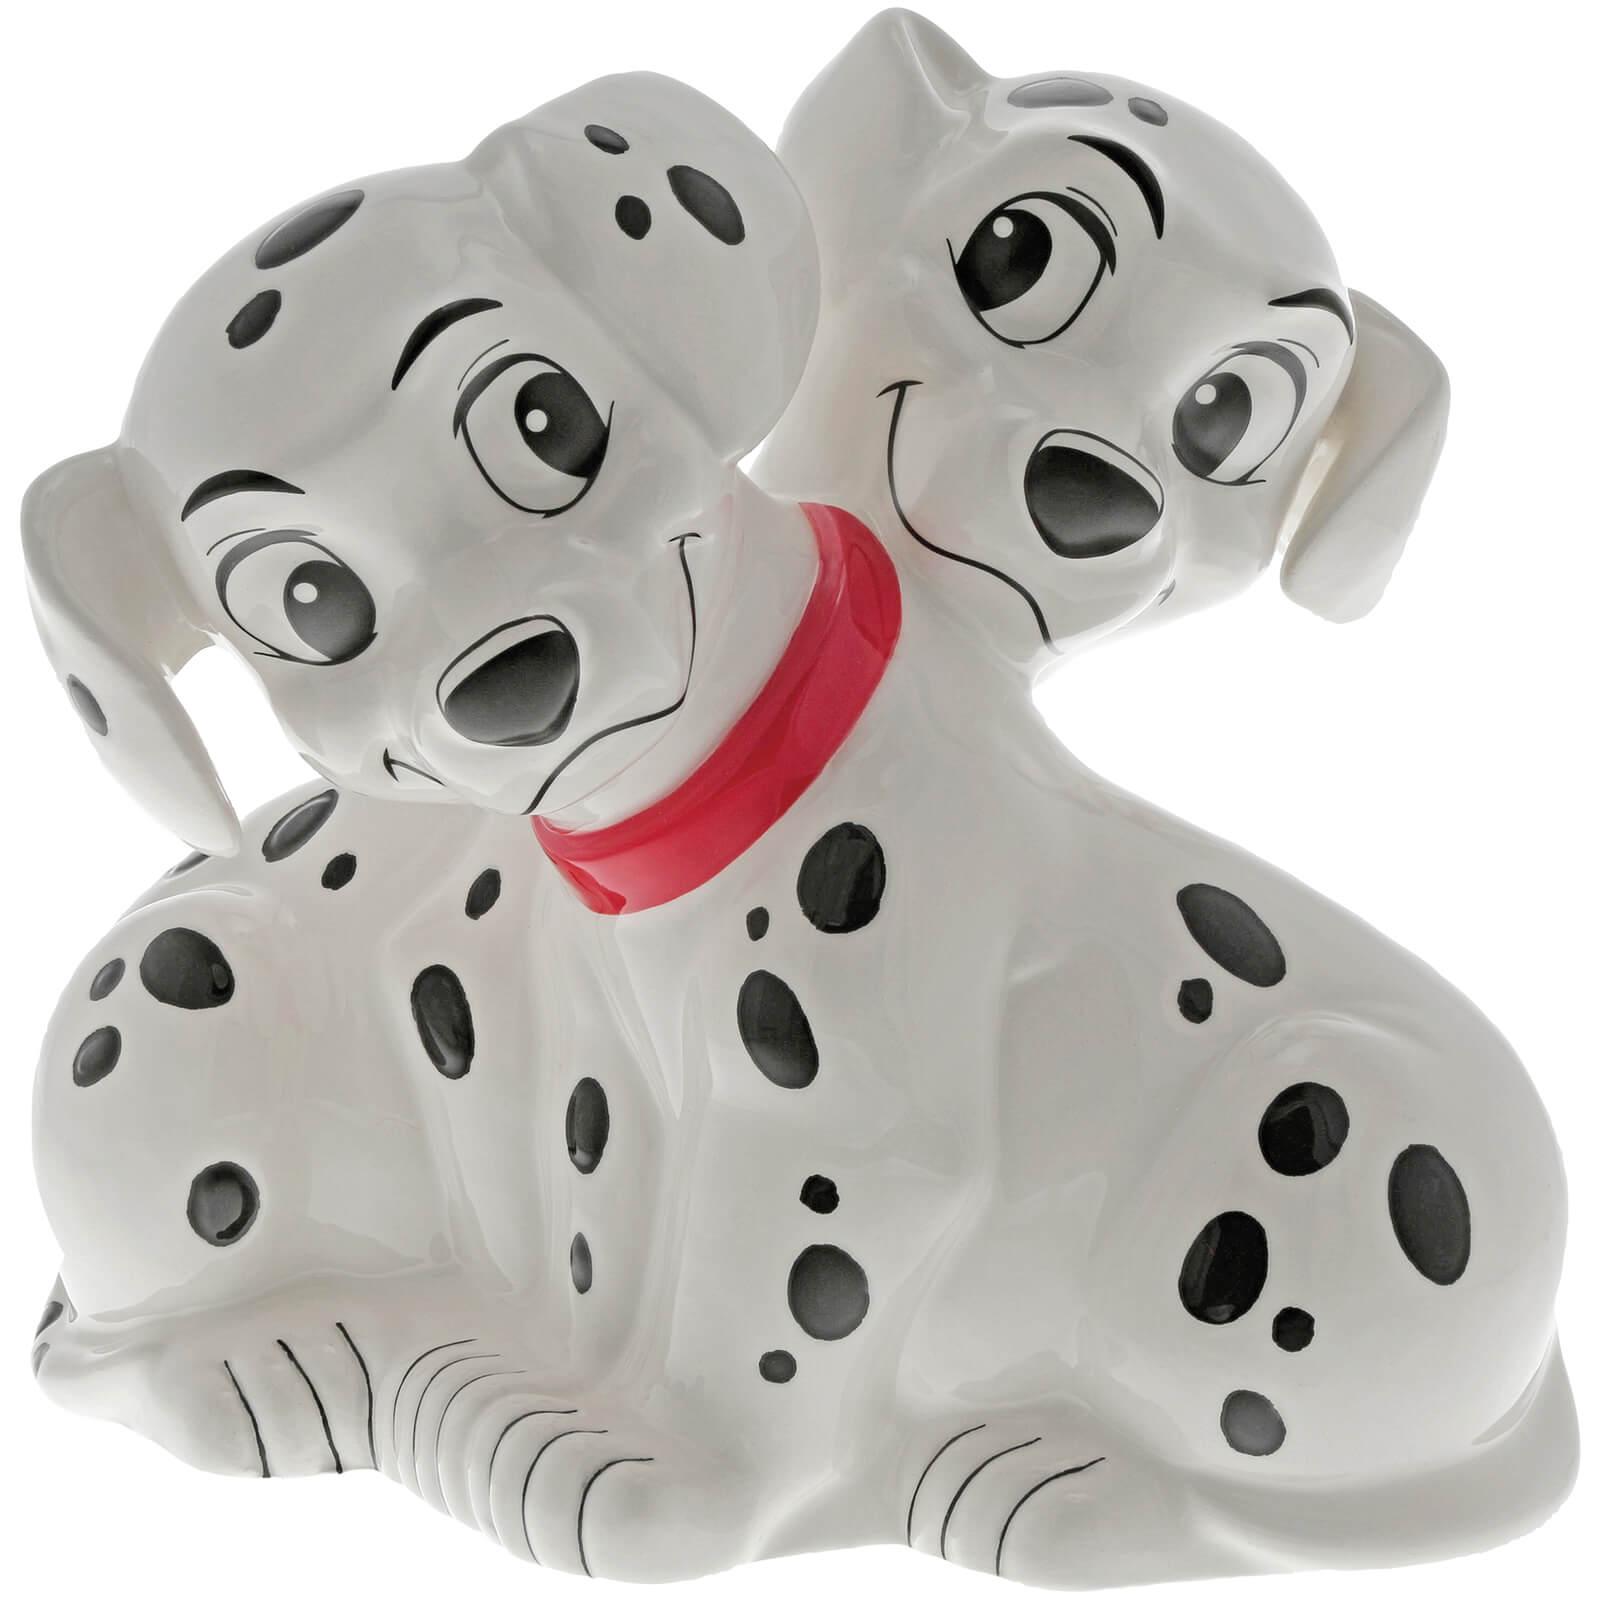 Image of Enchanting Disney Collection Friend for Life (101 Dalmatians Money Bank) 13cm